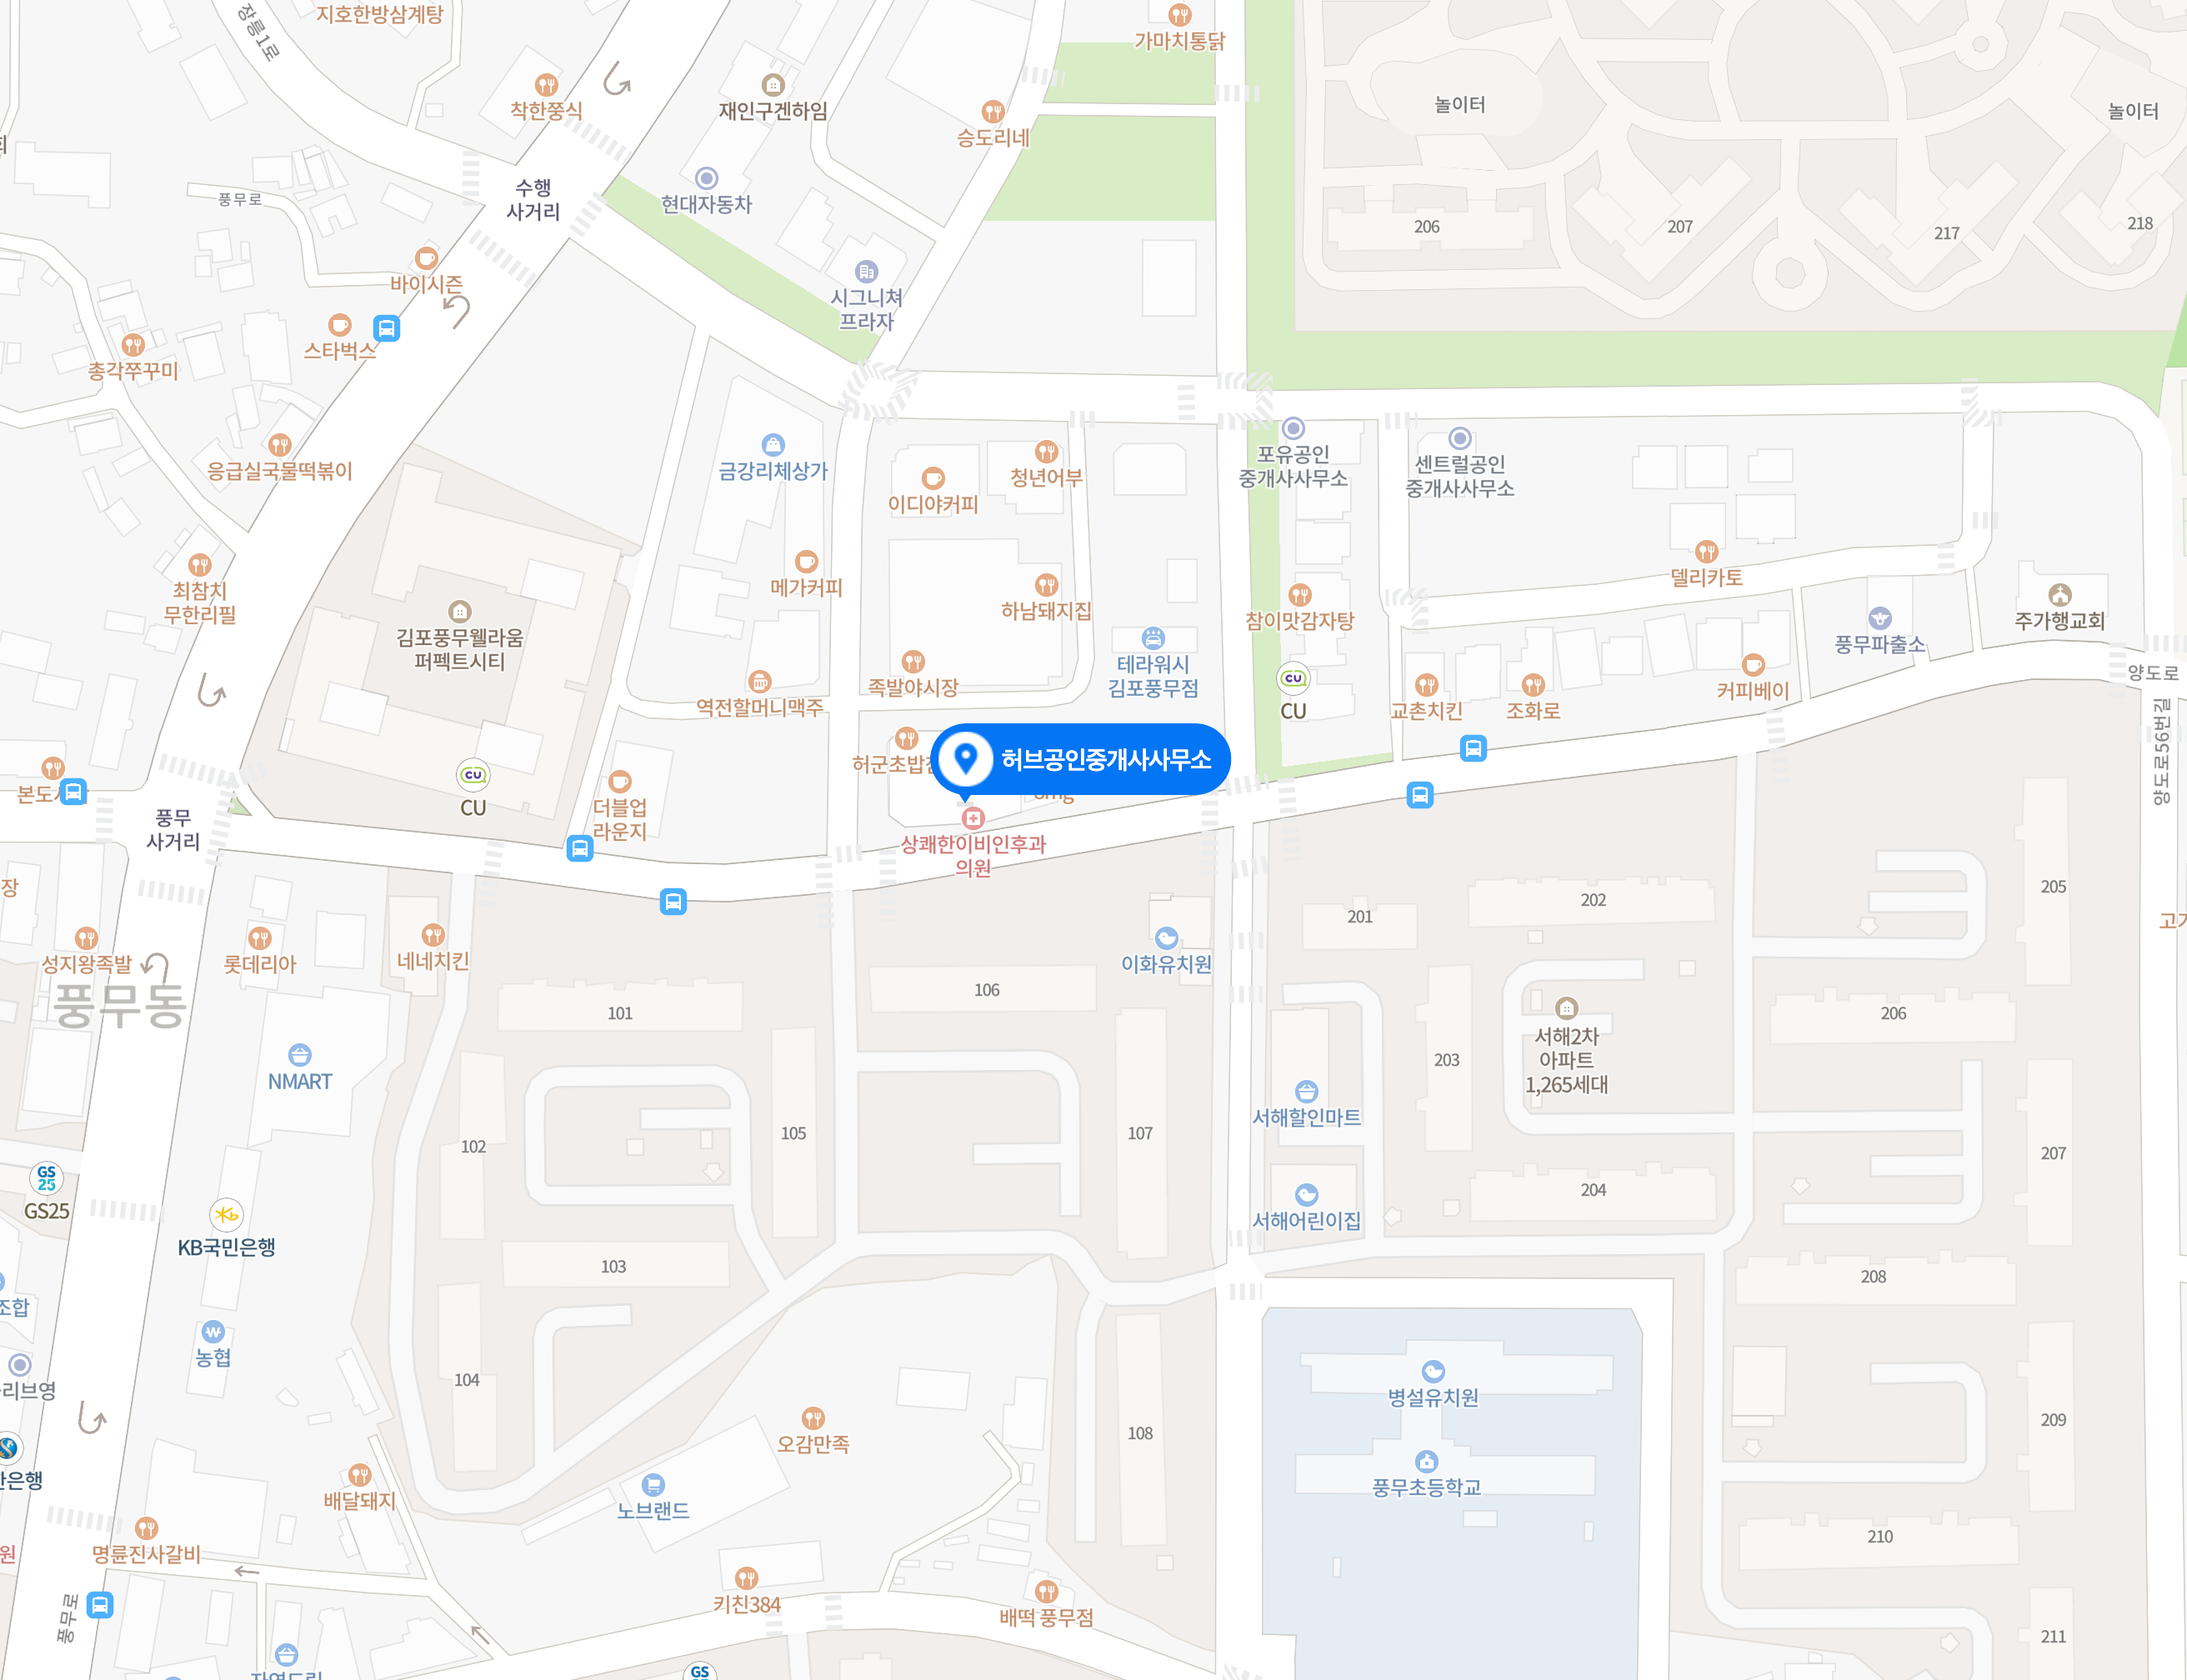 naver_map.png